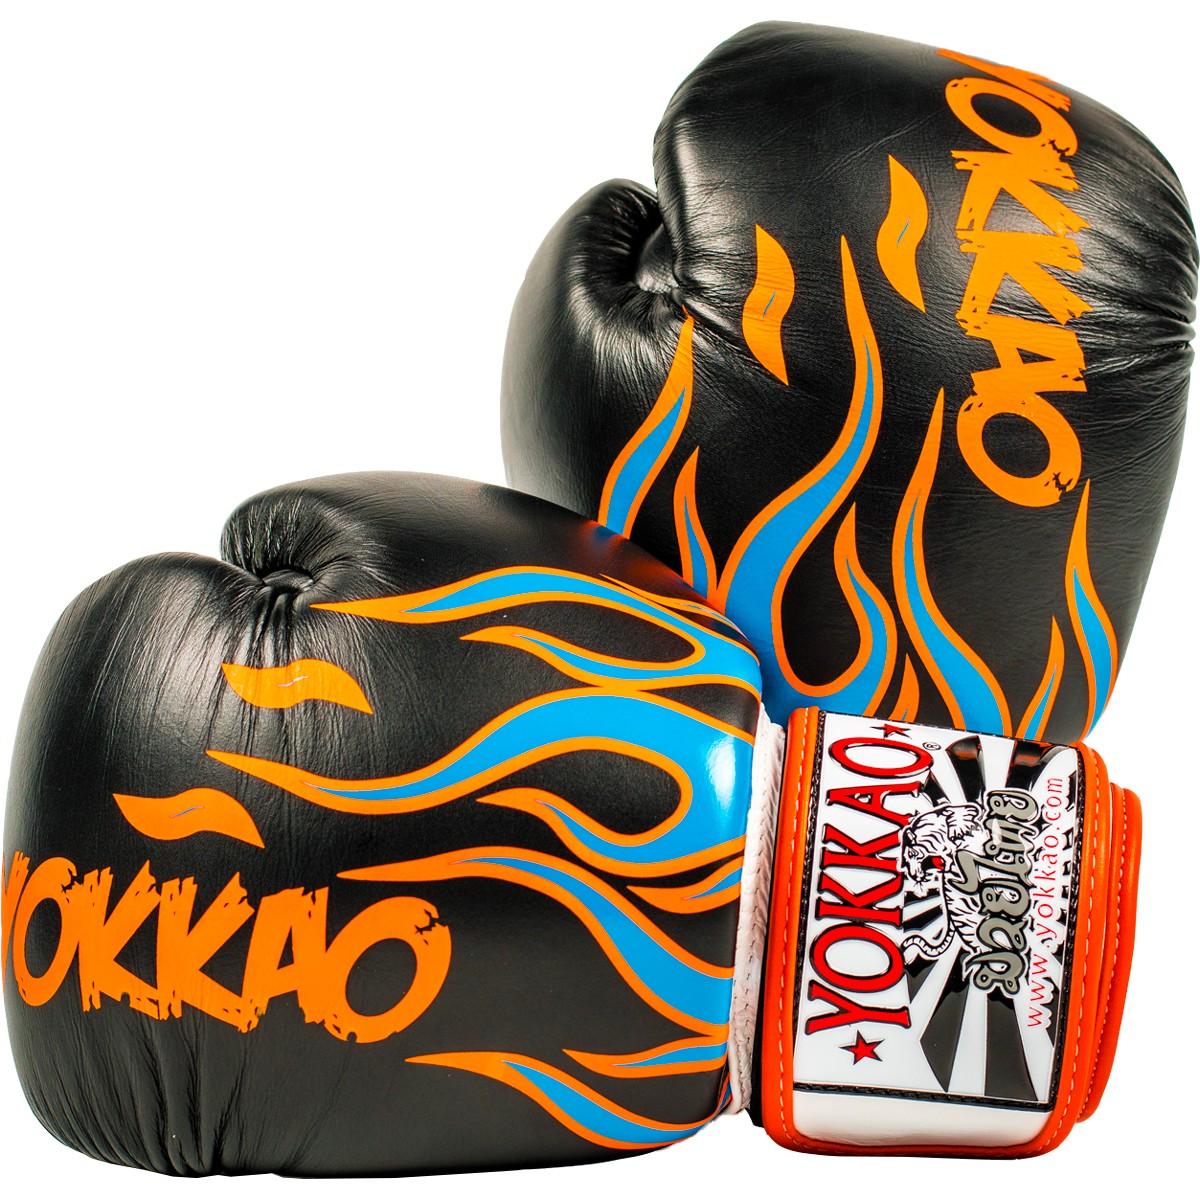 inferno-black-muay-thai-boxing-gloves-4b1